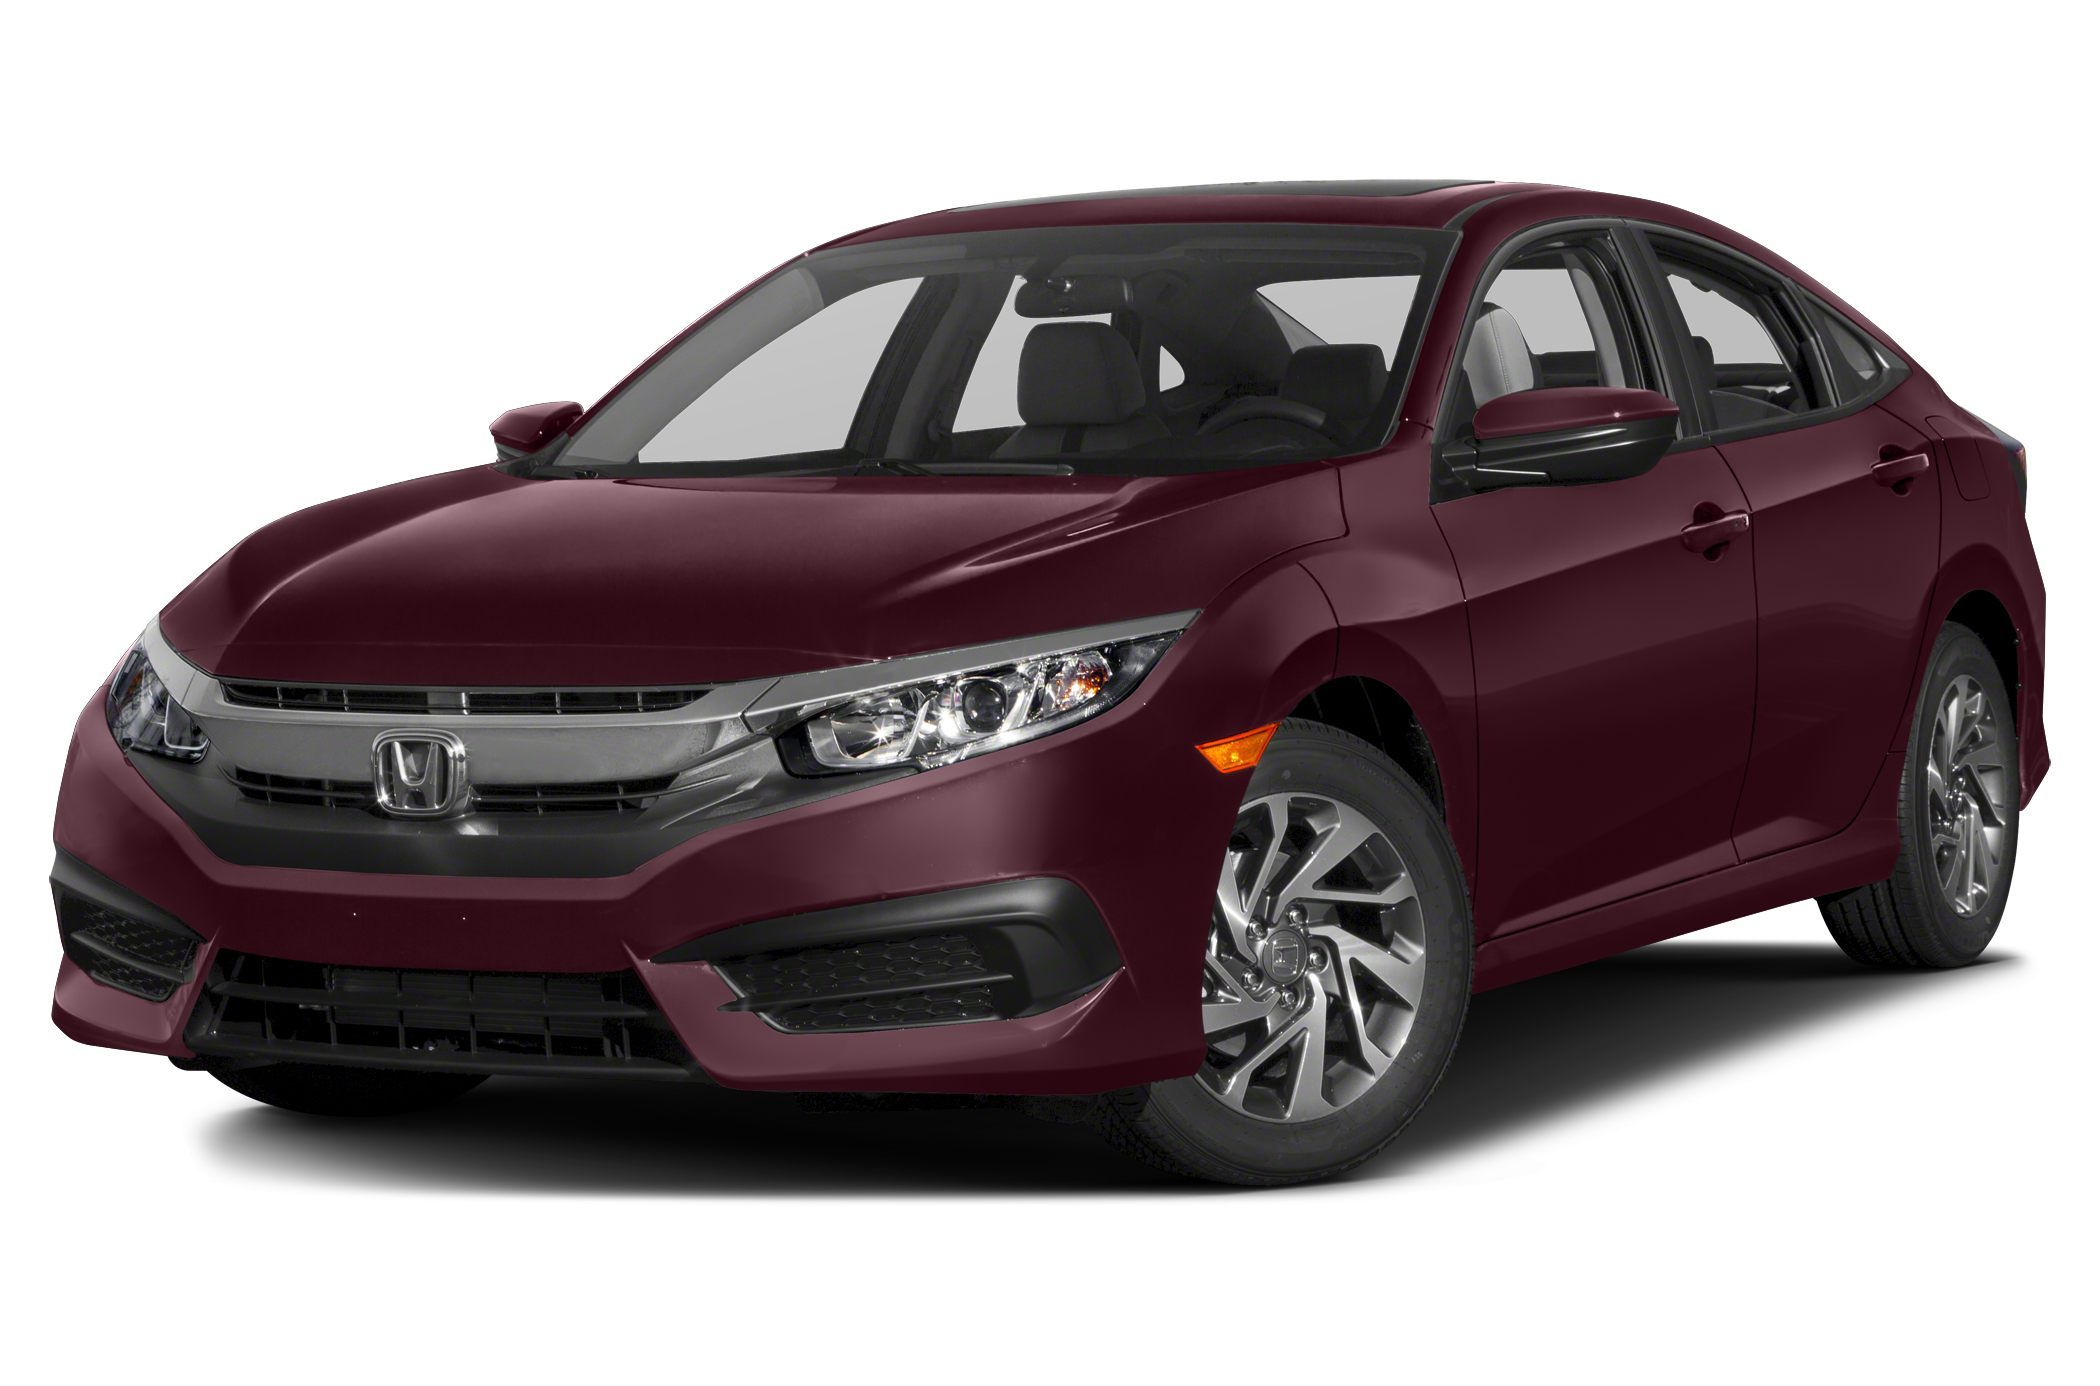 2016 Toyota Corolla vs 2016 Honda Civic Overview